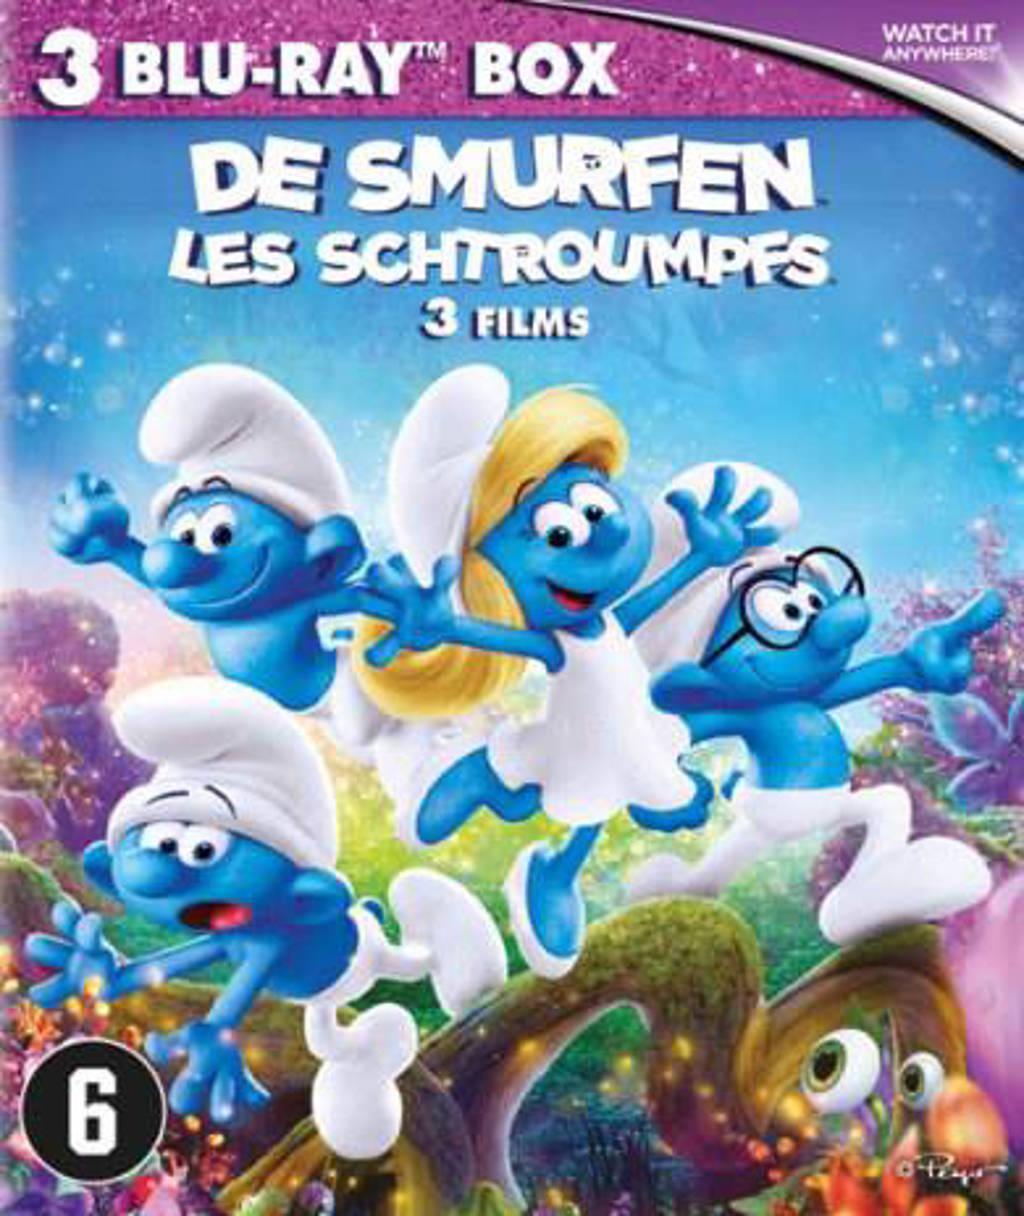 De Smurfen 1-3 (Blu-ray)